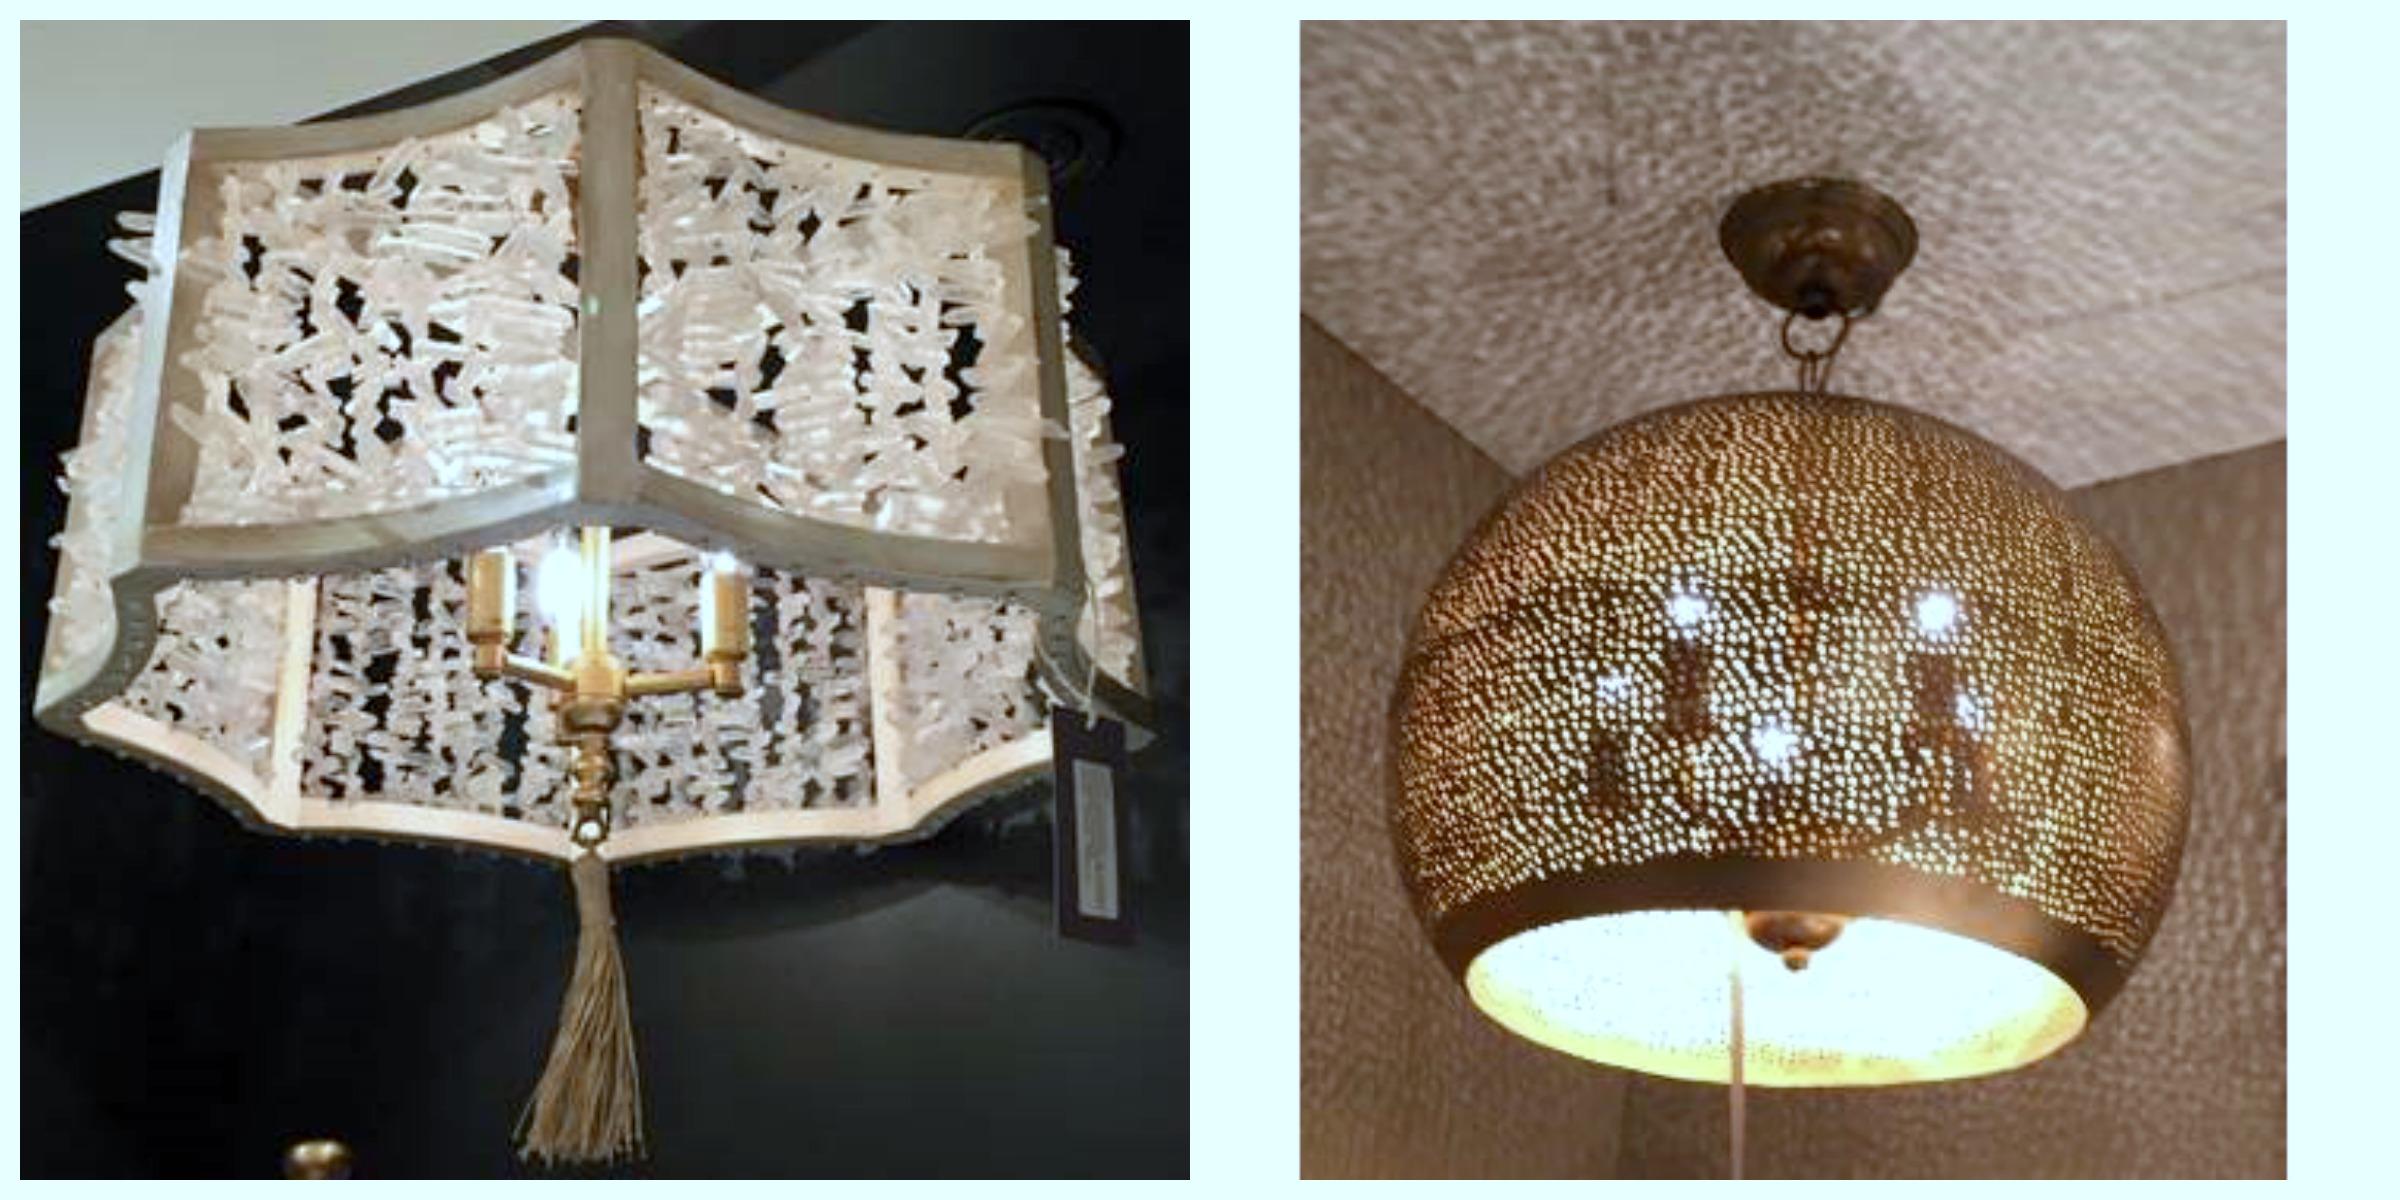 Lighting Collage 4 of Twin Companies